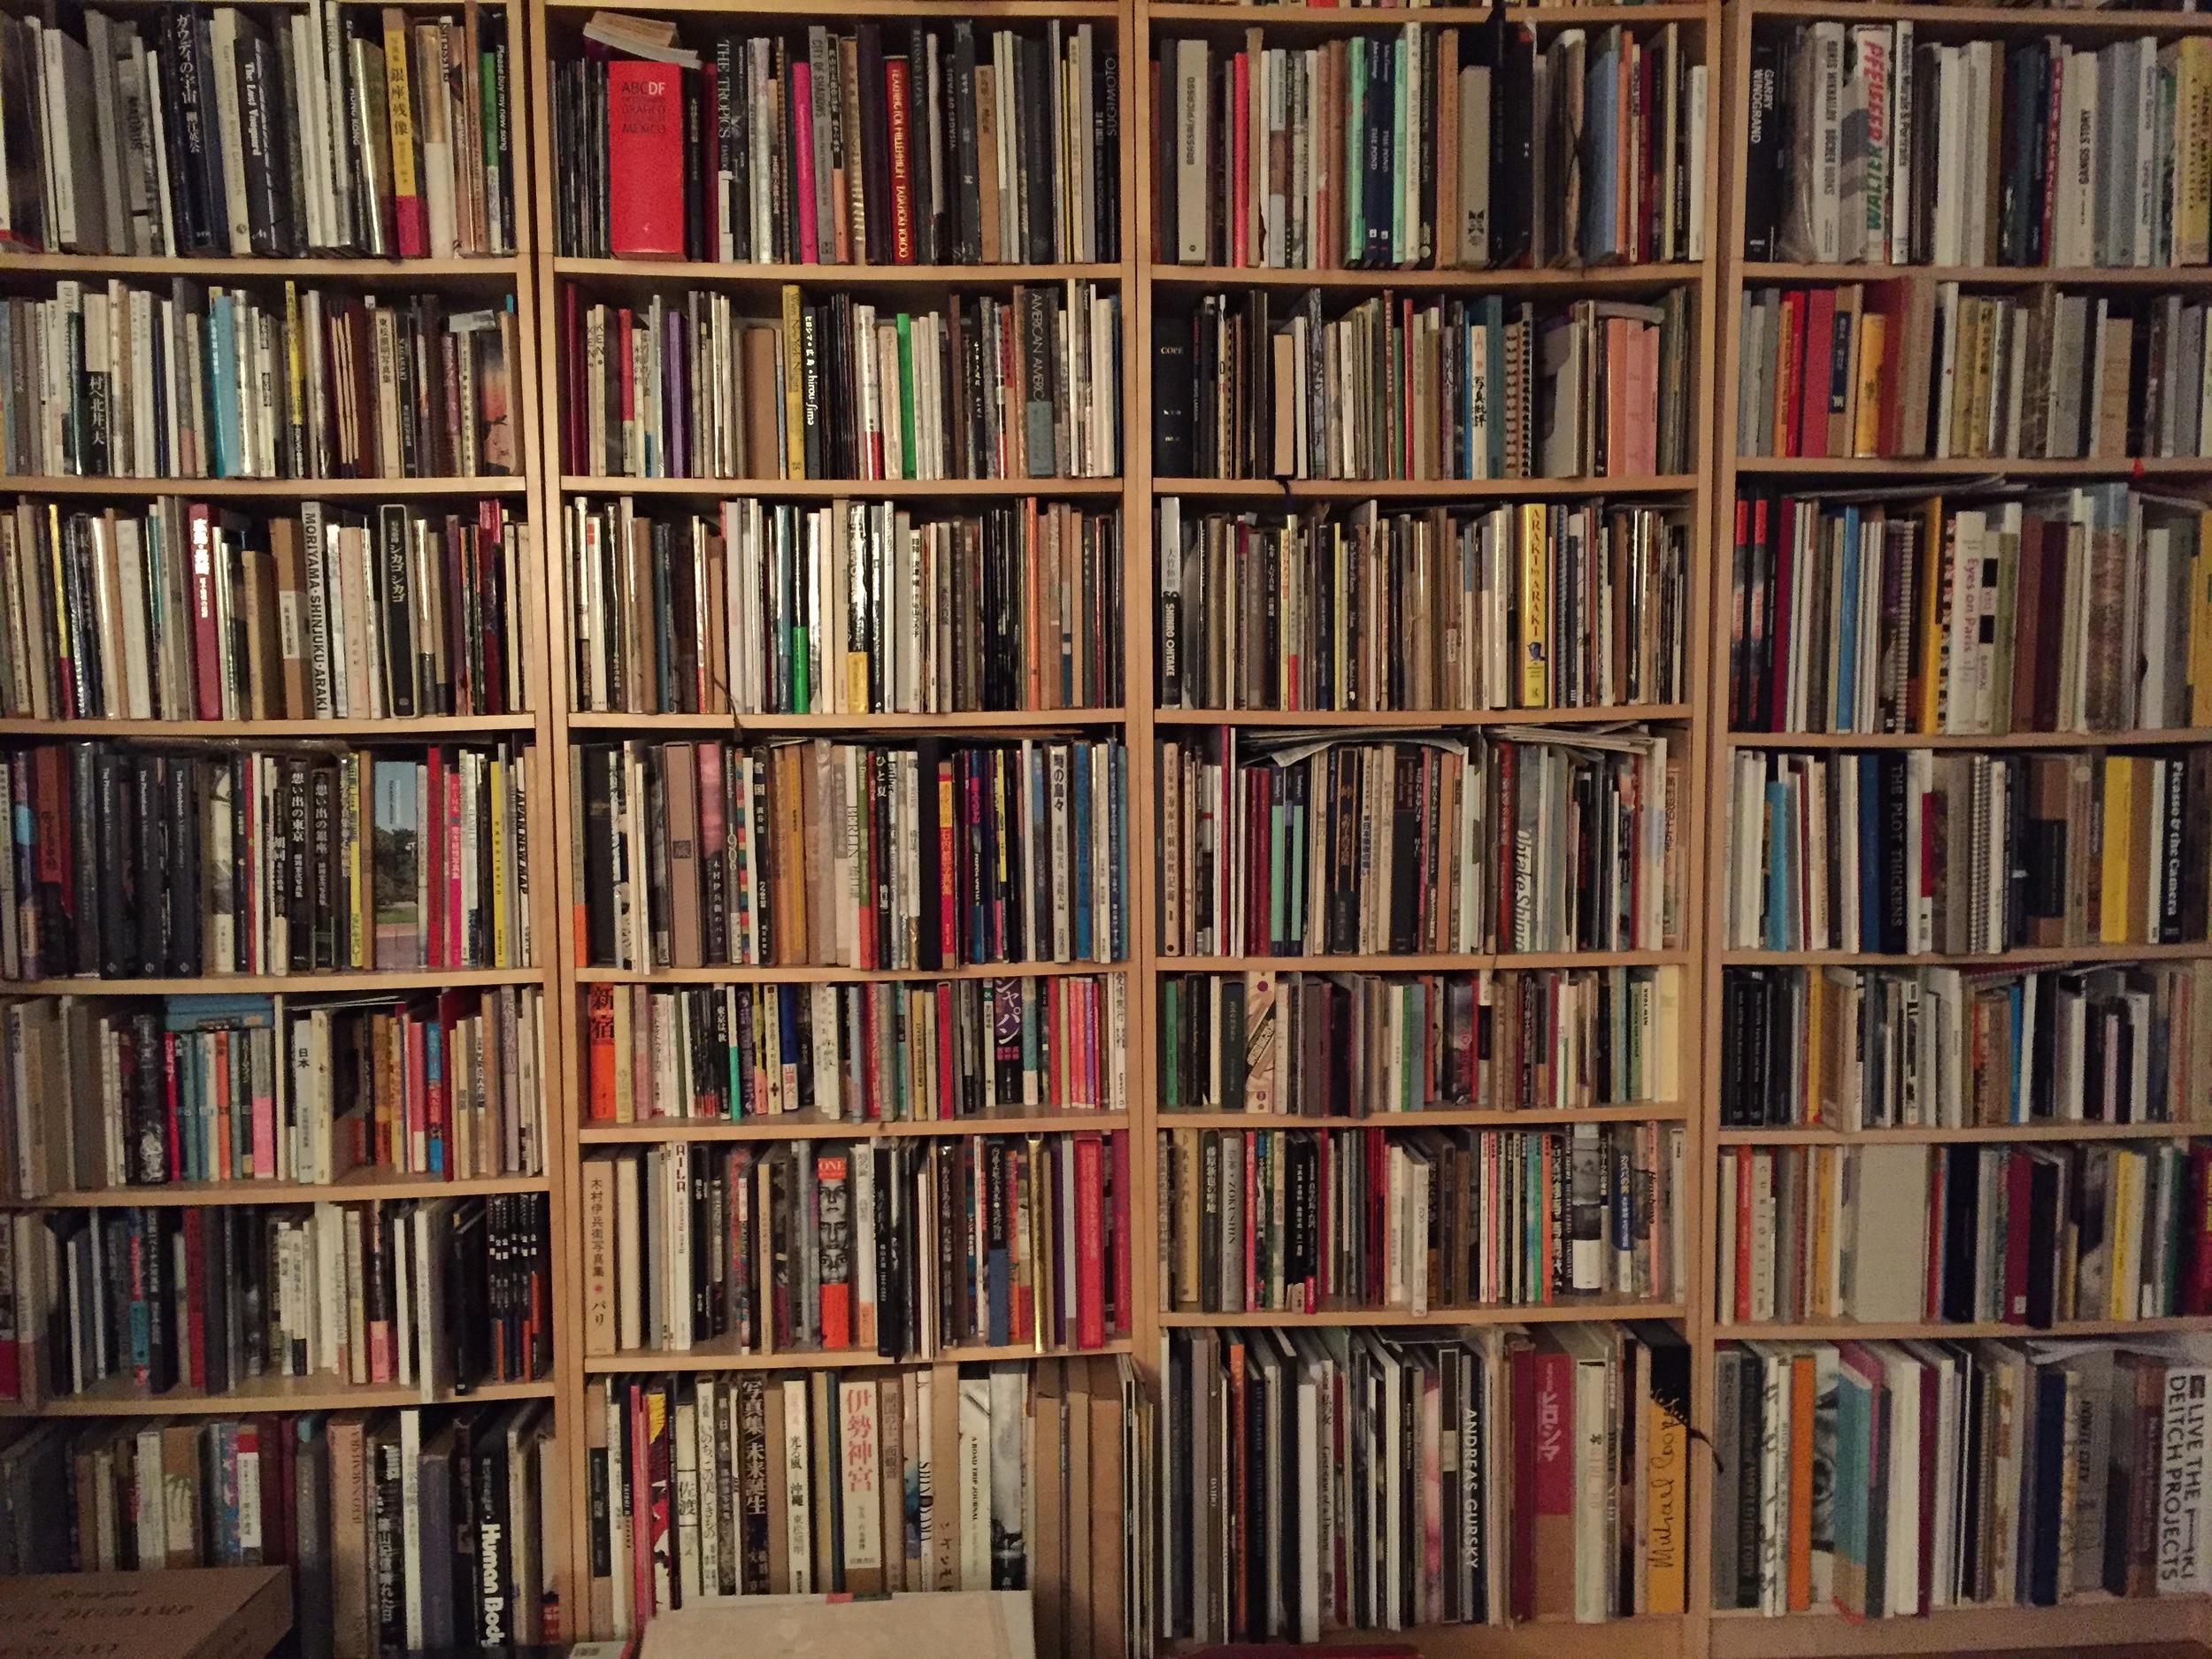 John Gossage's wall of books.